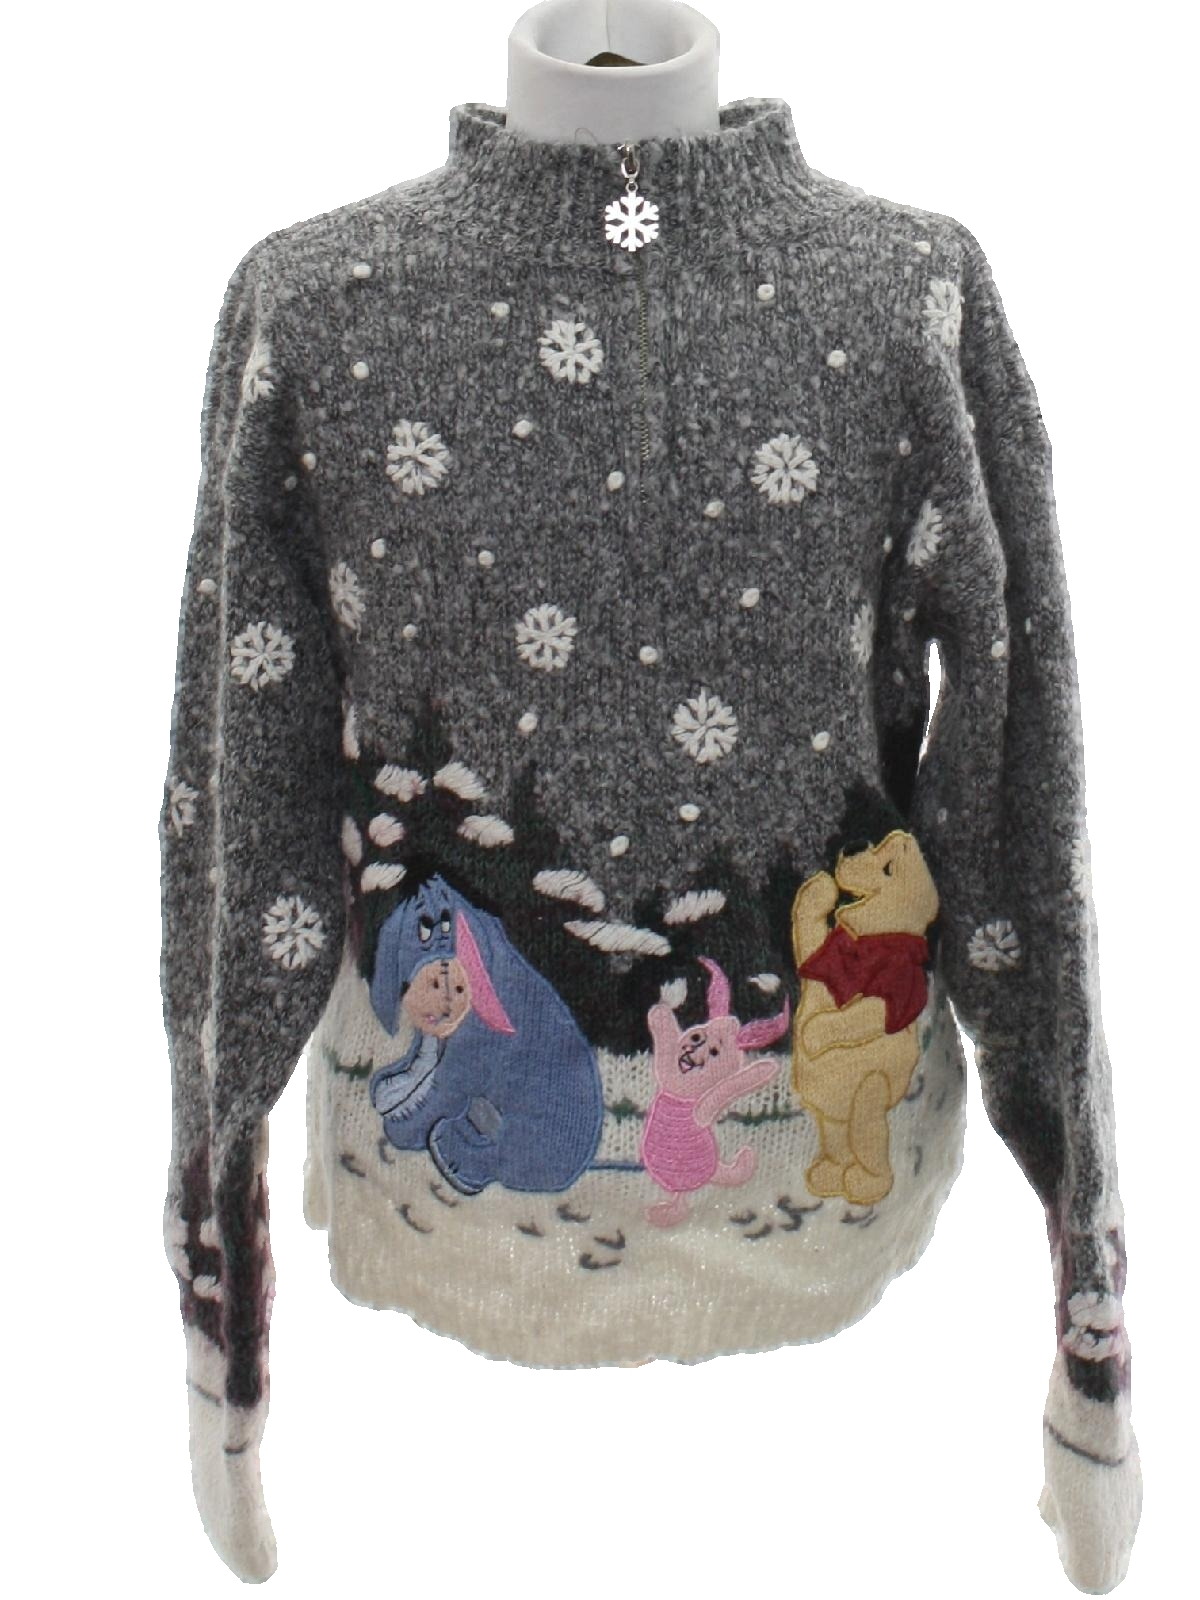 Womens WInnie The Pooh Ugly Christmas Sweater  -Disney- Womens white ... 956a0ff329